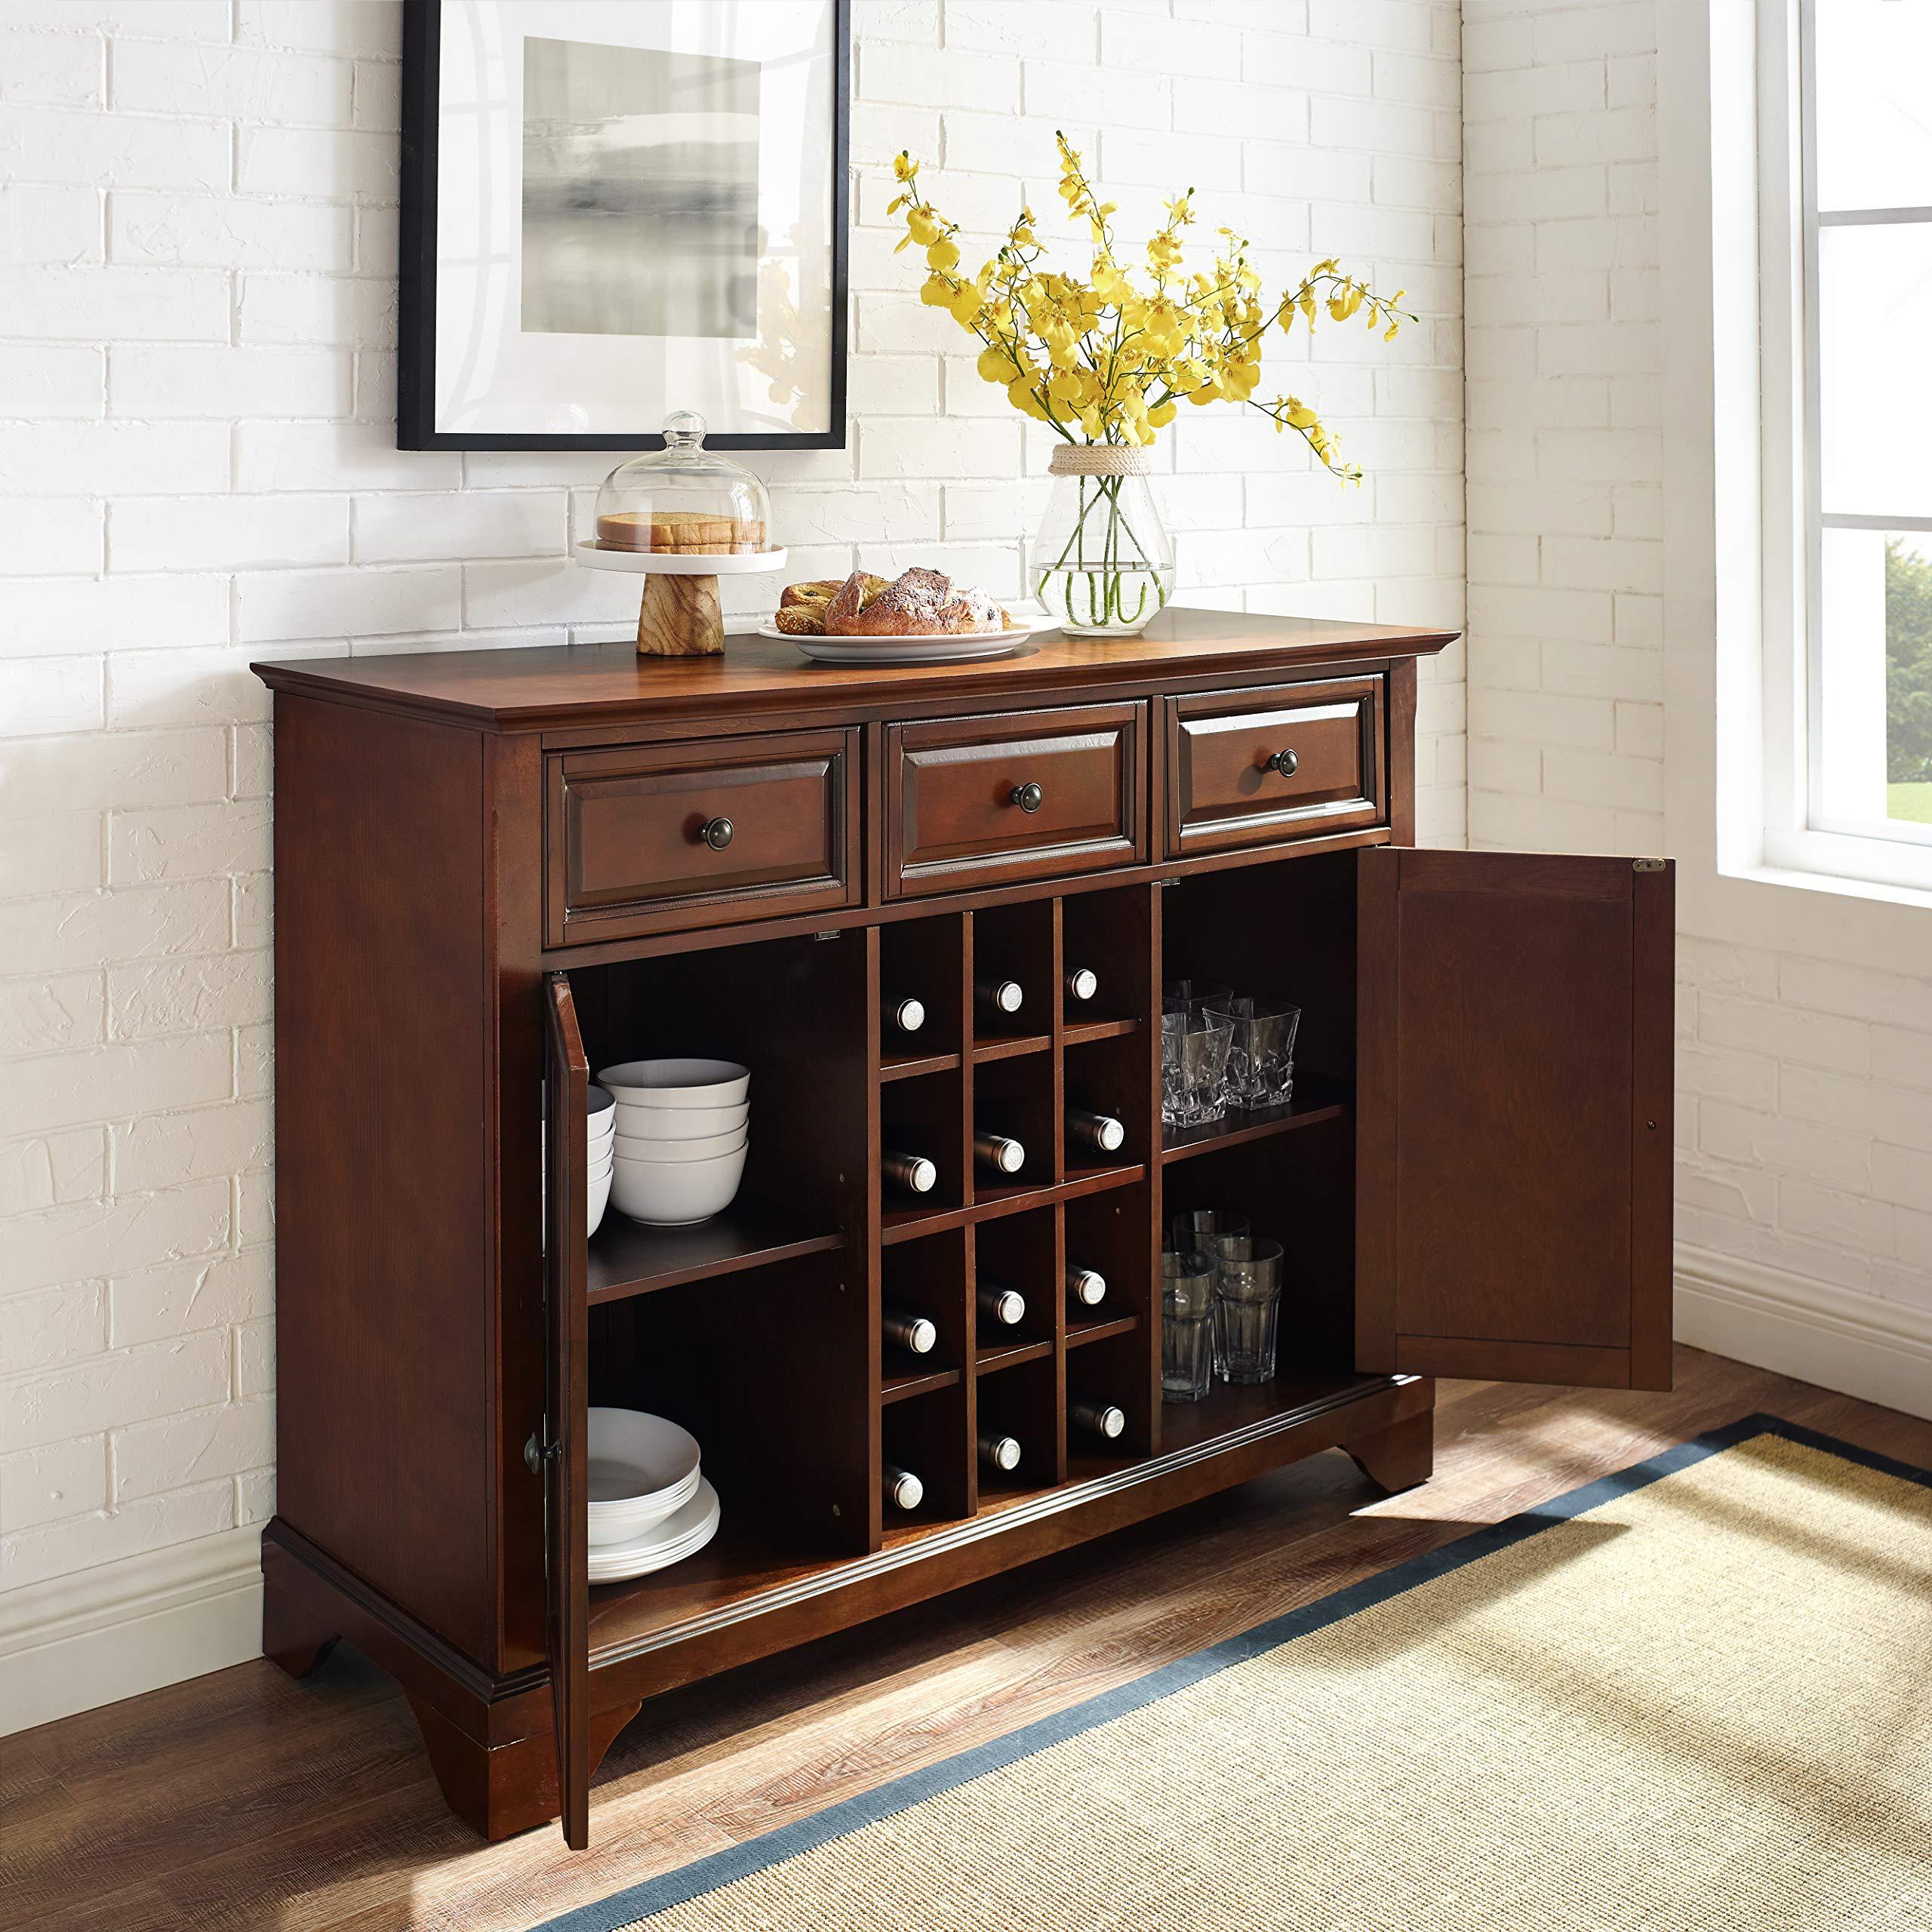 Crosley Furniture LaFayette Wine Buffet / Sideboard - Vintage Mahogany by Crosley Furniture (Image #4)